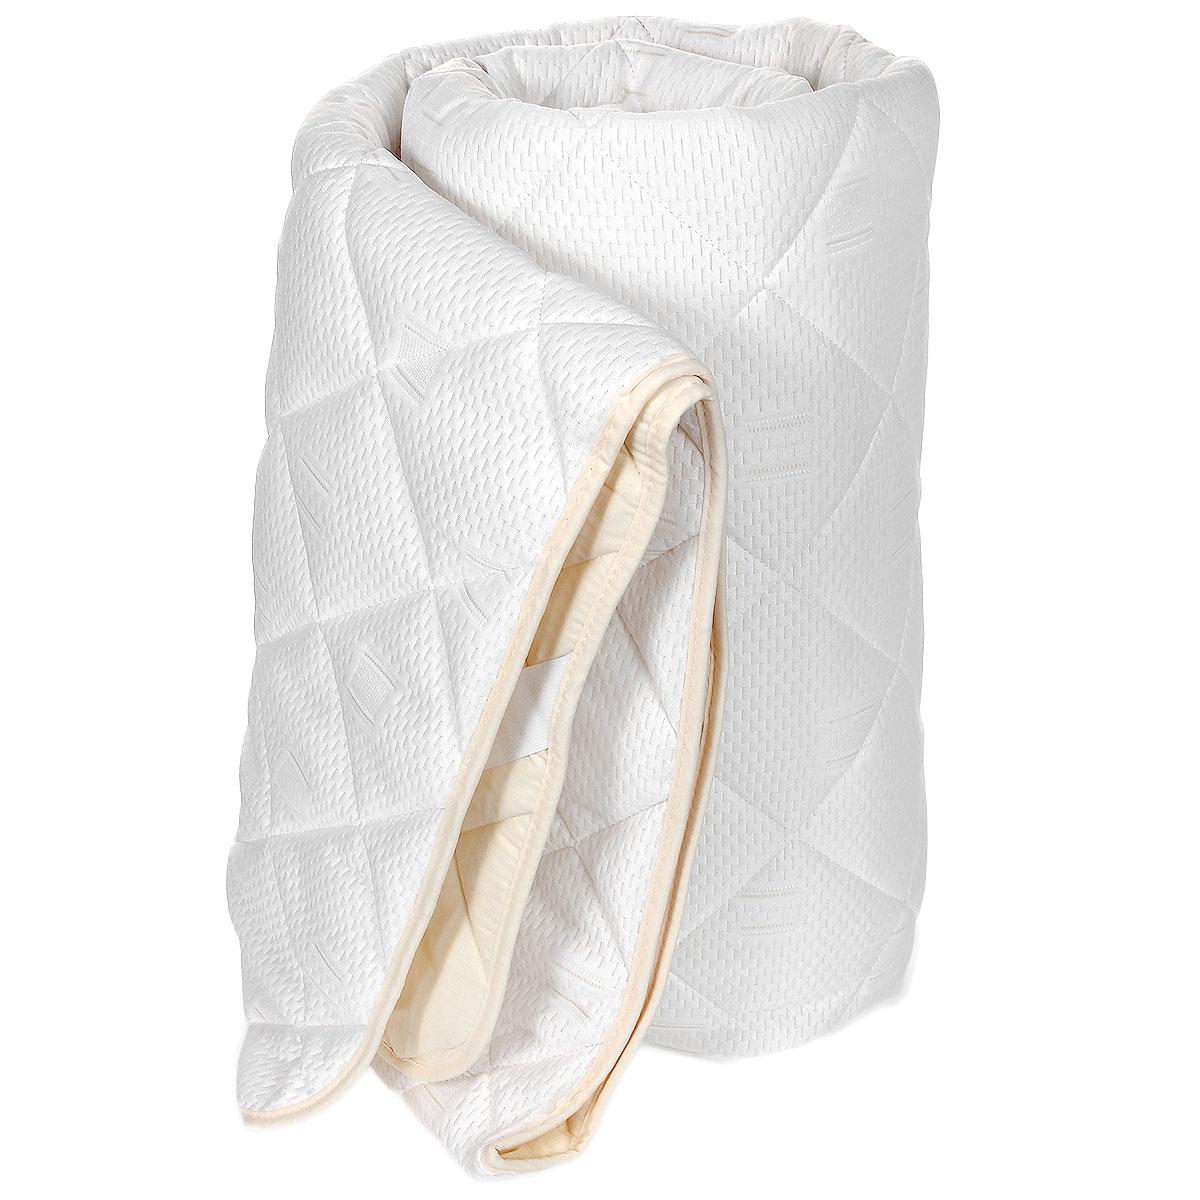 "Наматрасник OL-Tex ""Бамбук"", цвет: сливочный, 160 см х 200 см ОБТ-160"